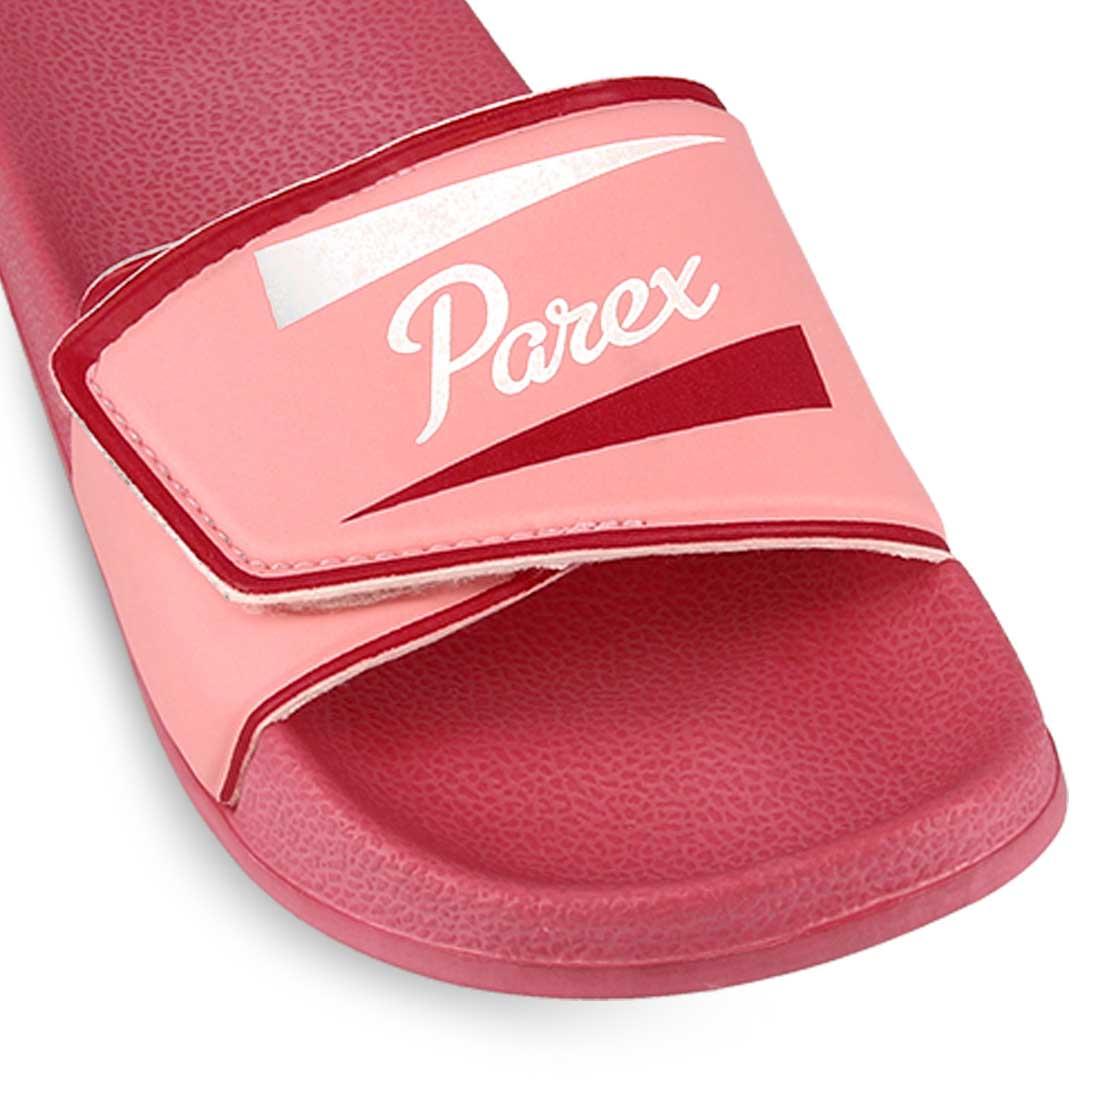 Parex Σαγιονάρες 11823013.PI Ροζ